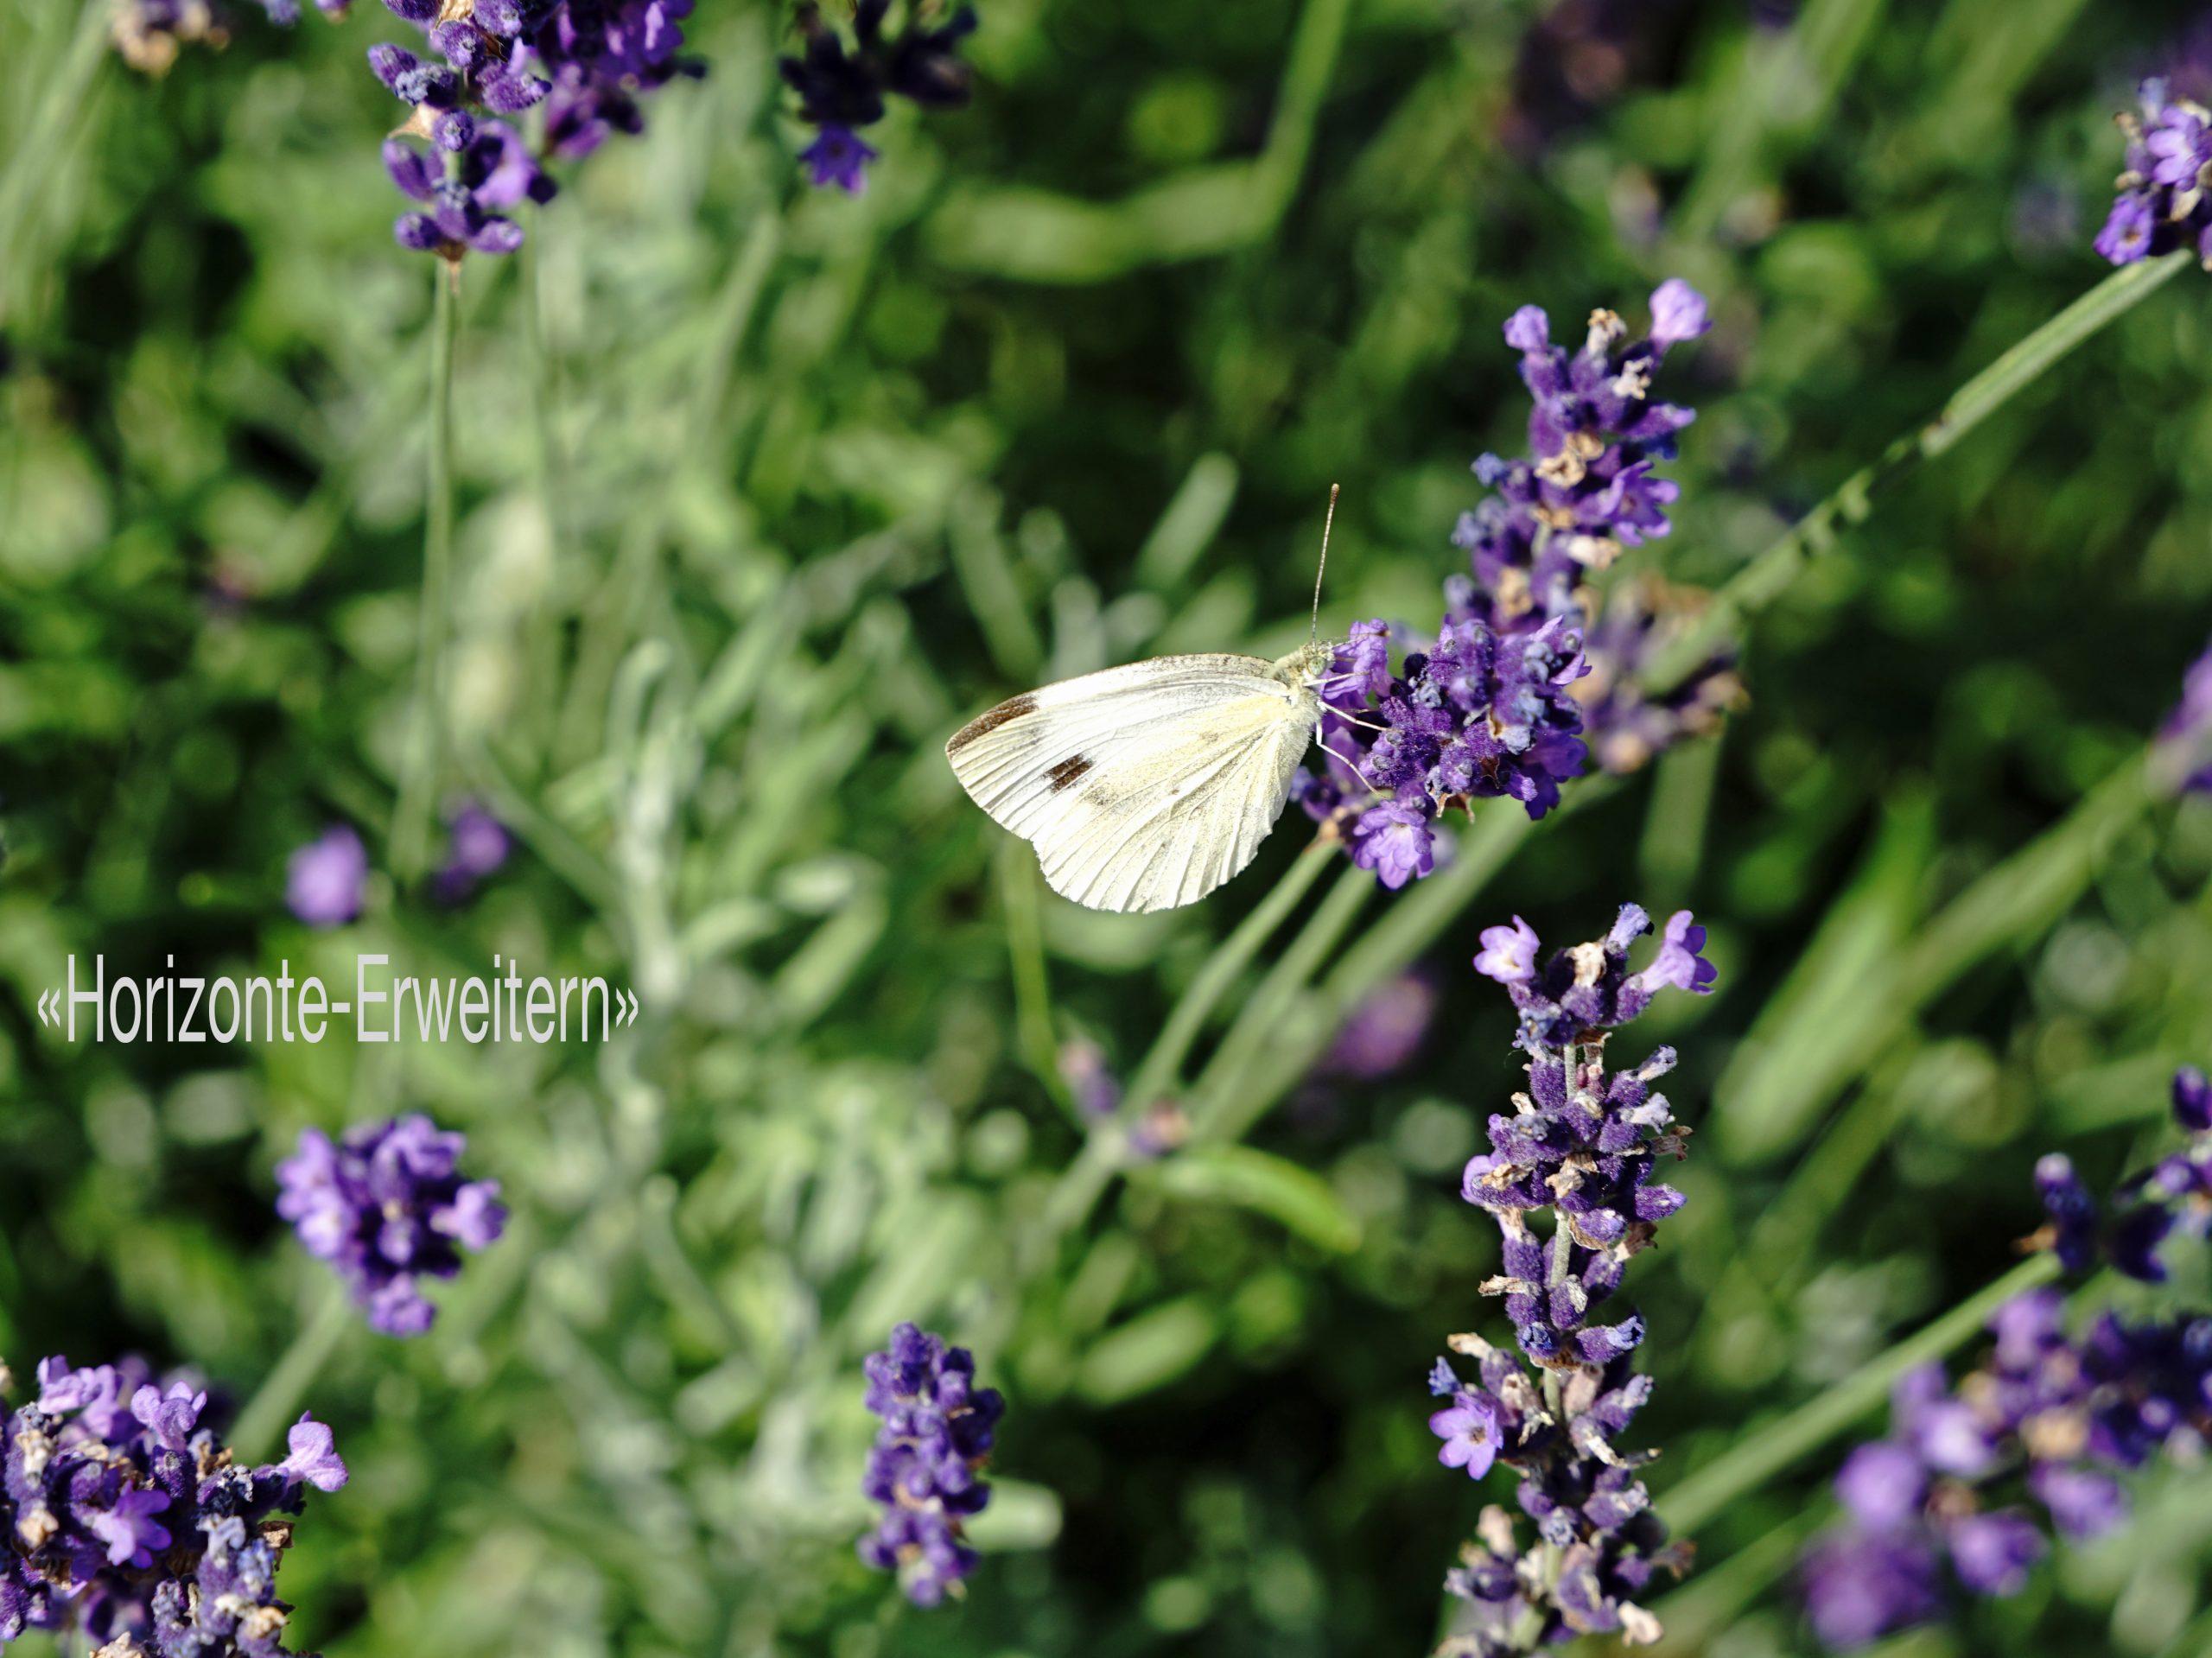 Kohlweissling auf violetter Lavendelblüte